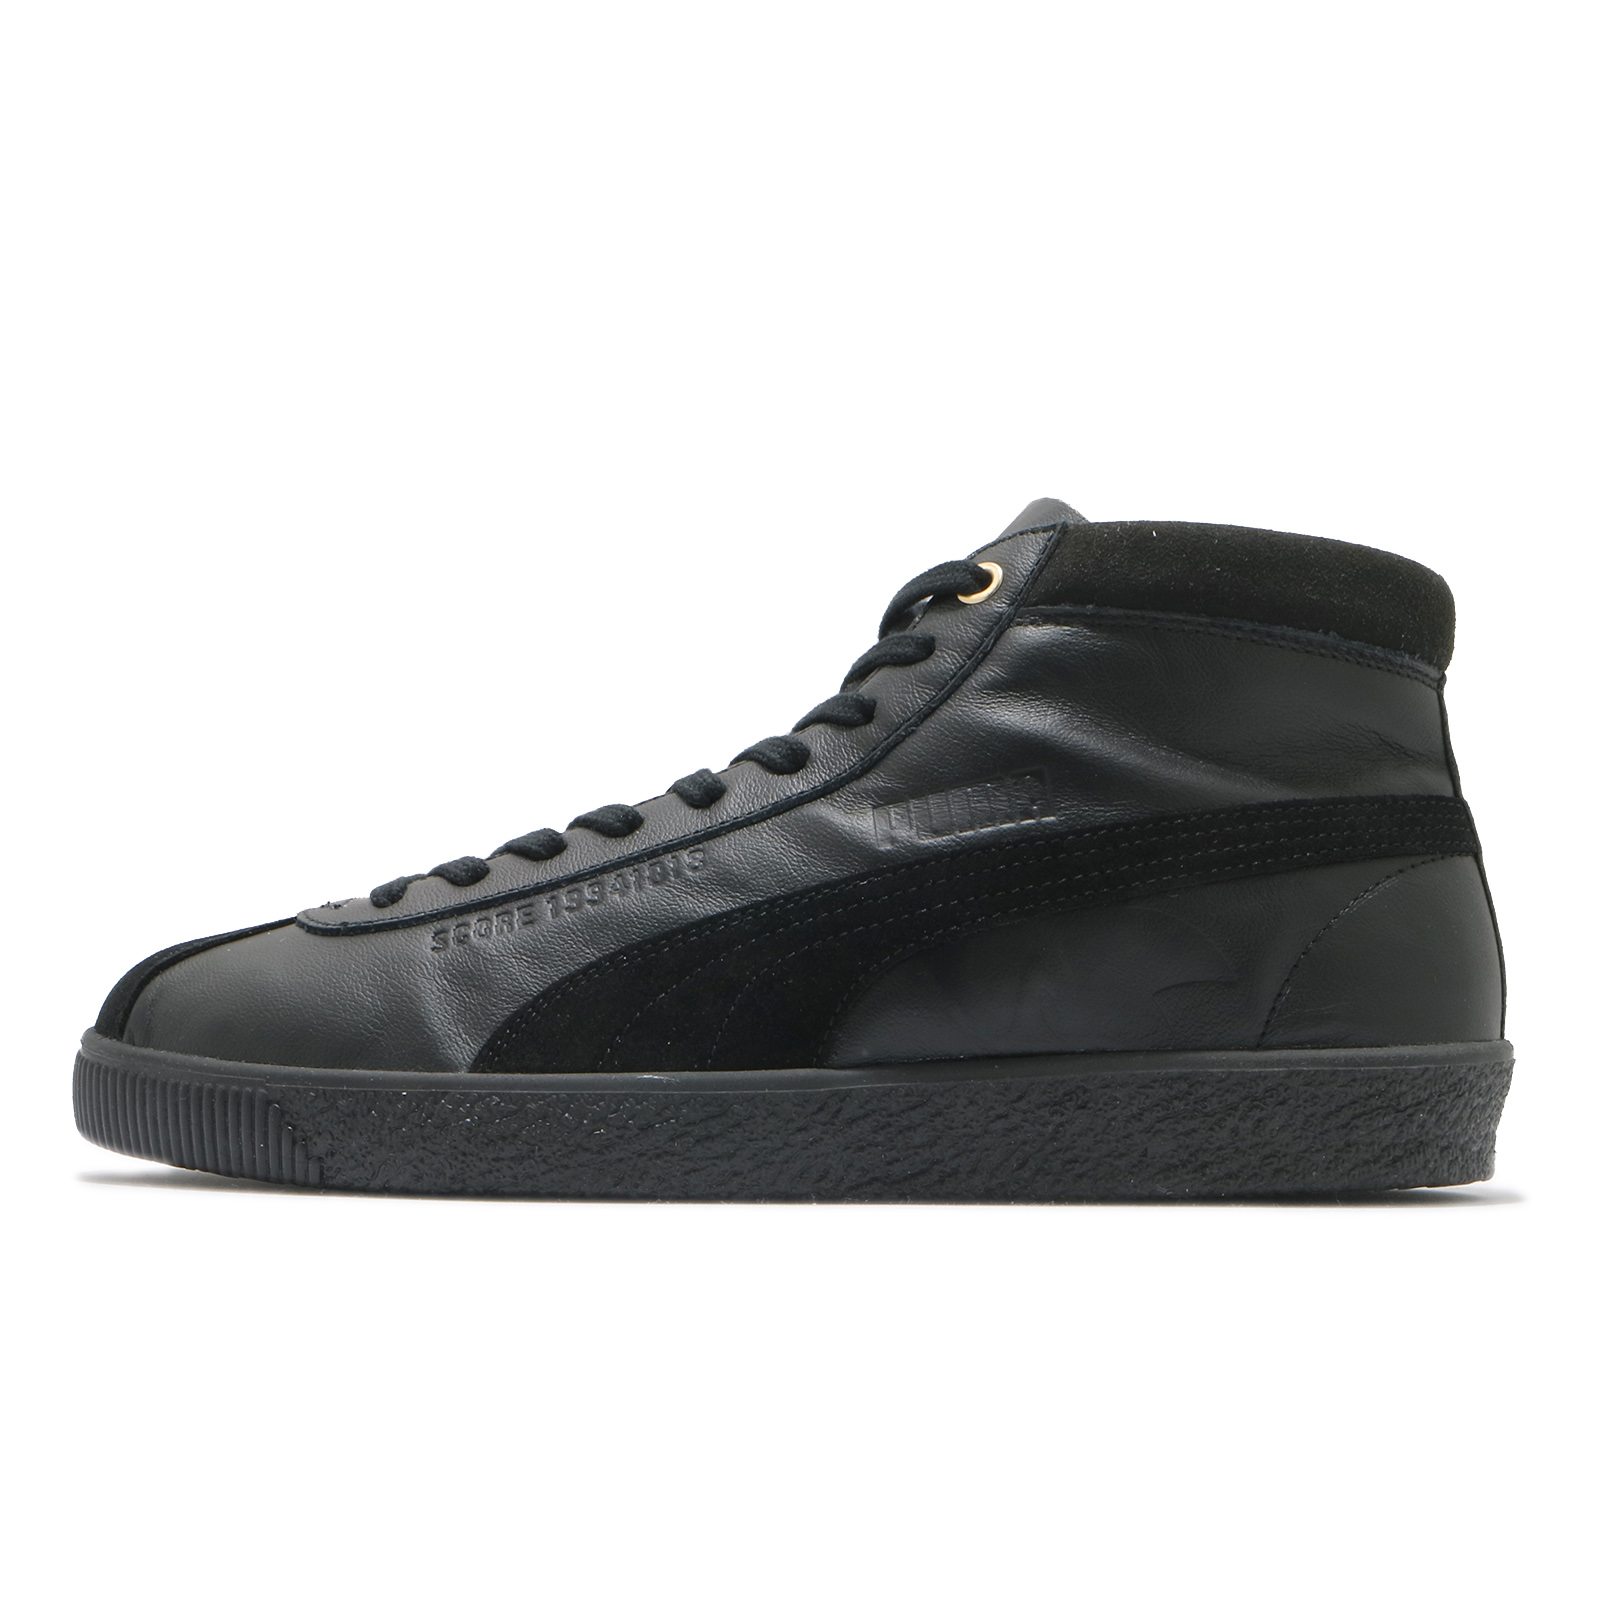 Puma 休閒鞋 Basket 68 Sonic 黑 金 男女鞋 音速小子 聯名款 中筒 【ACS】 37343001